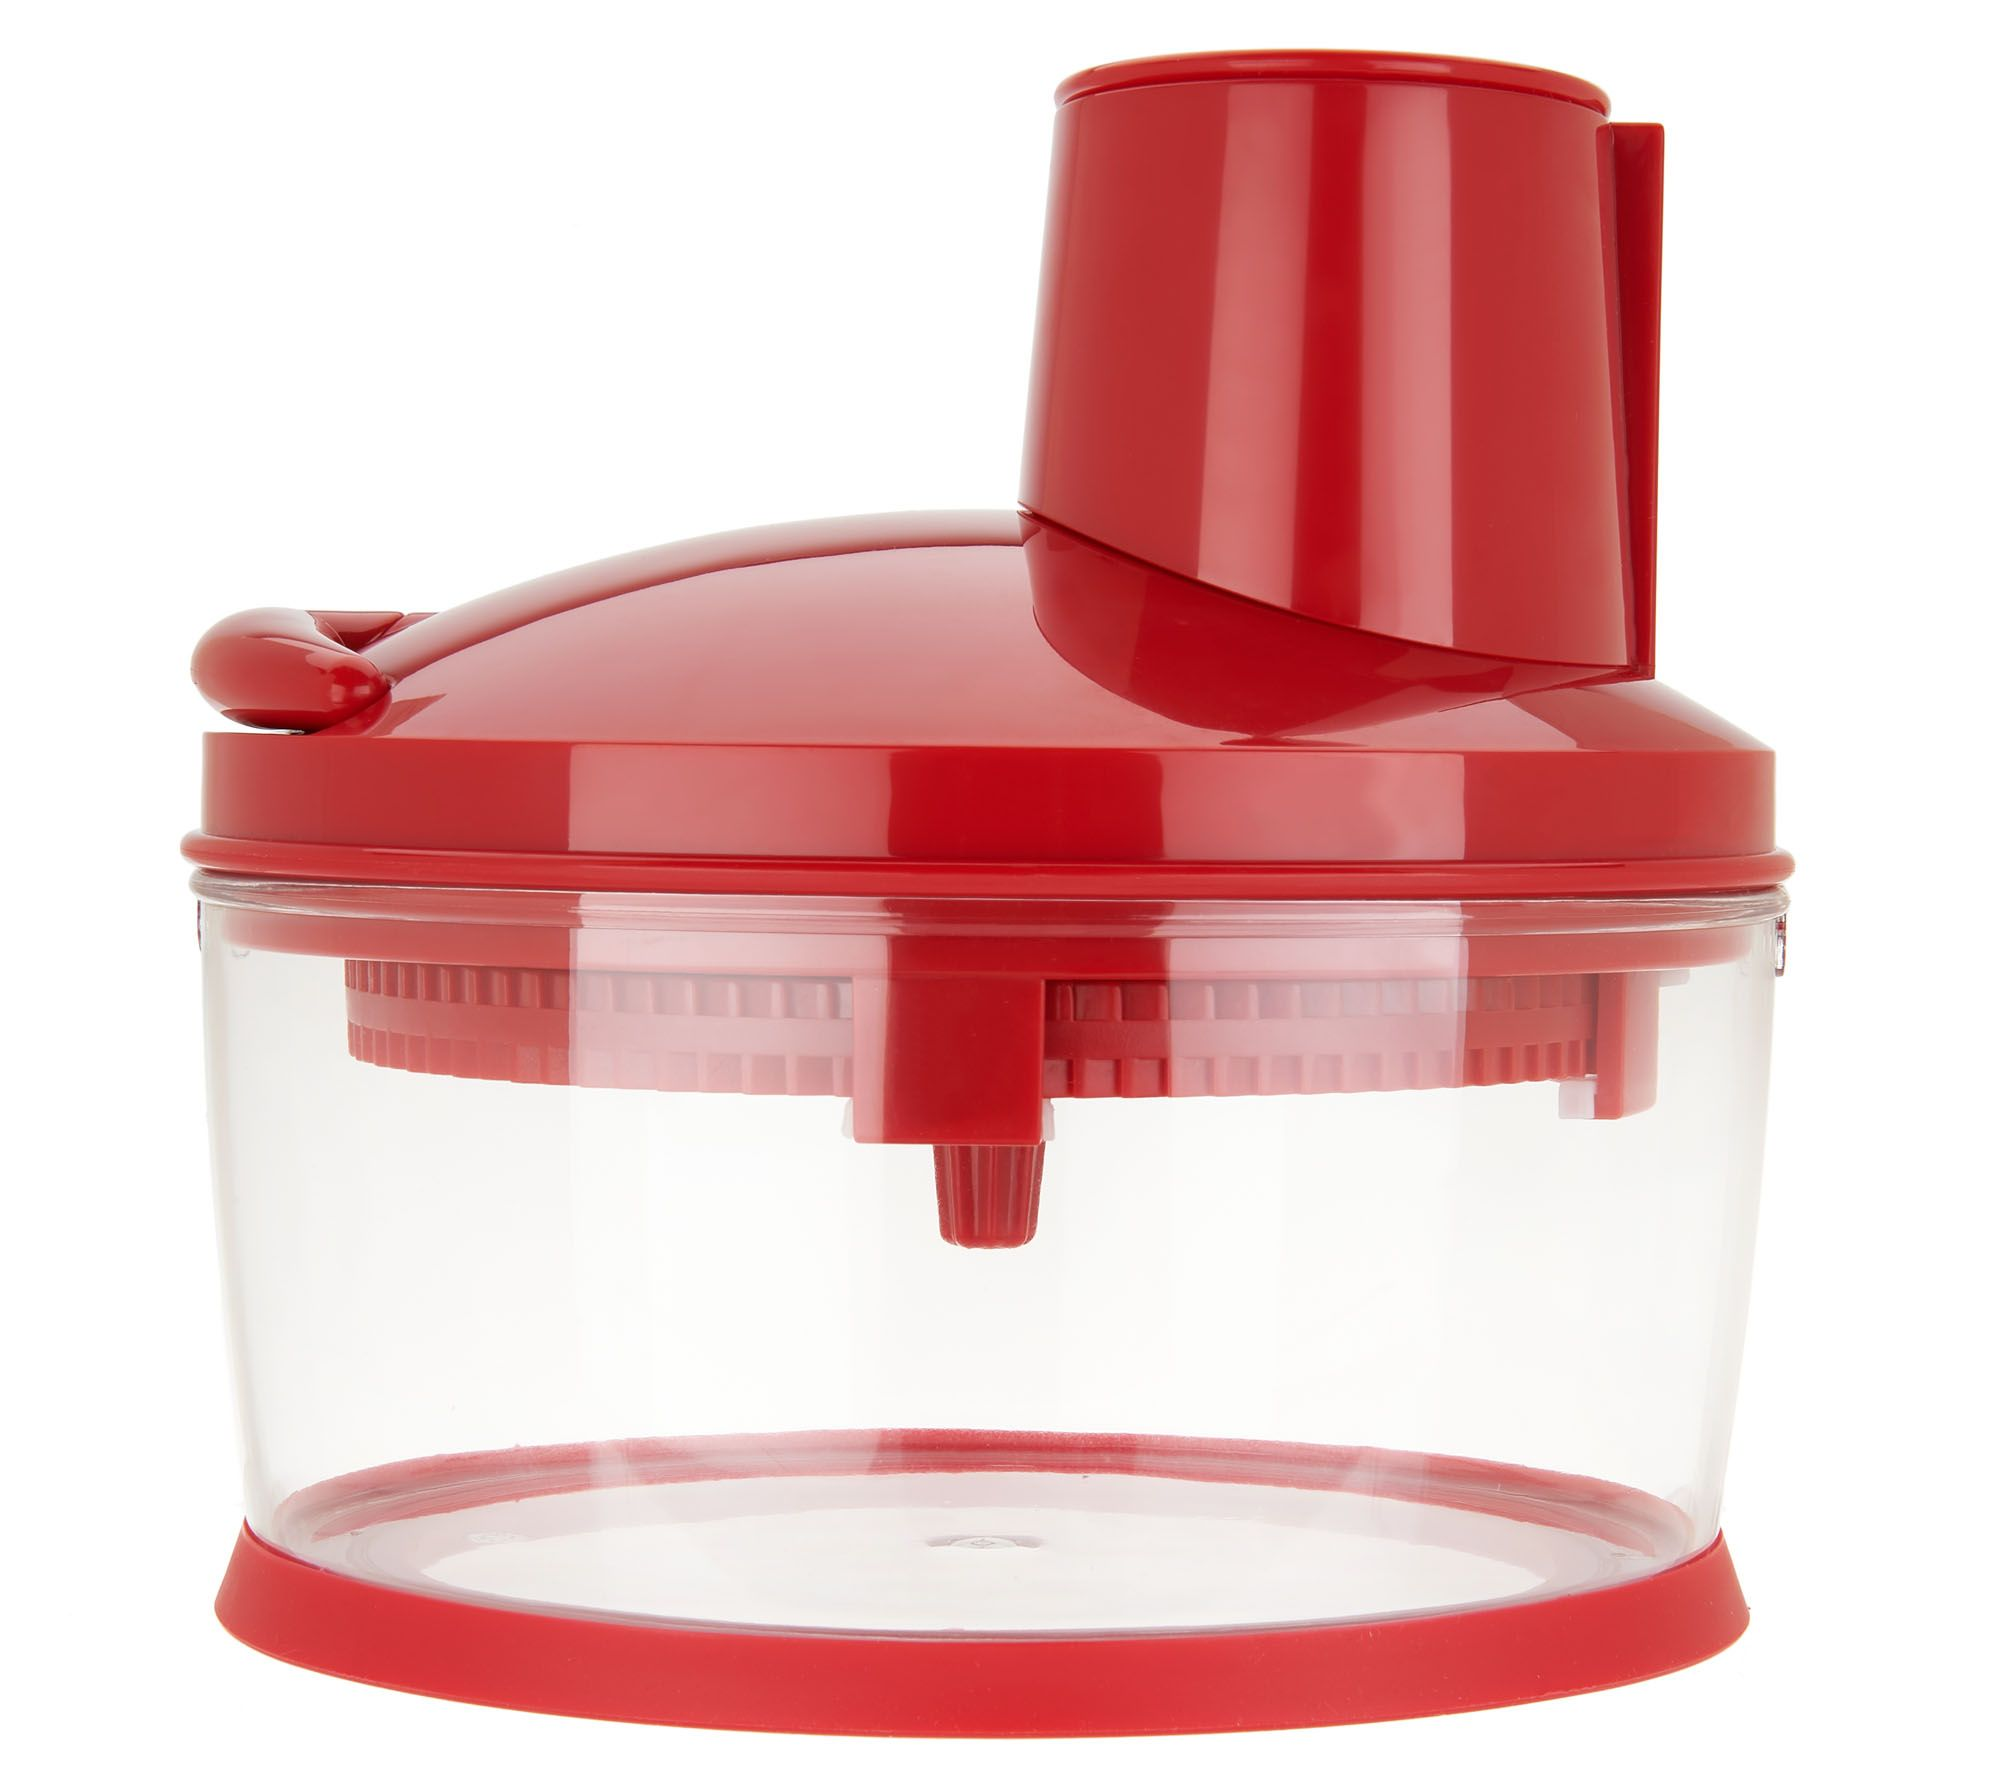 Kuhn-Rikon-4-Cup-Easy-Cut-Food-Slicer-amp-Grater-Model-K46999 thumbnail 5